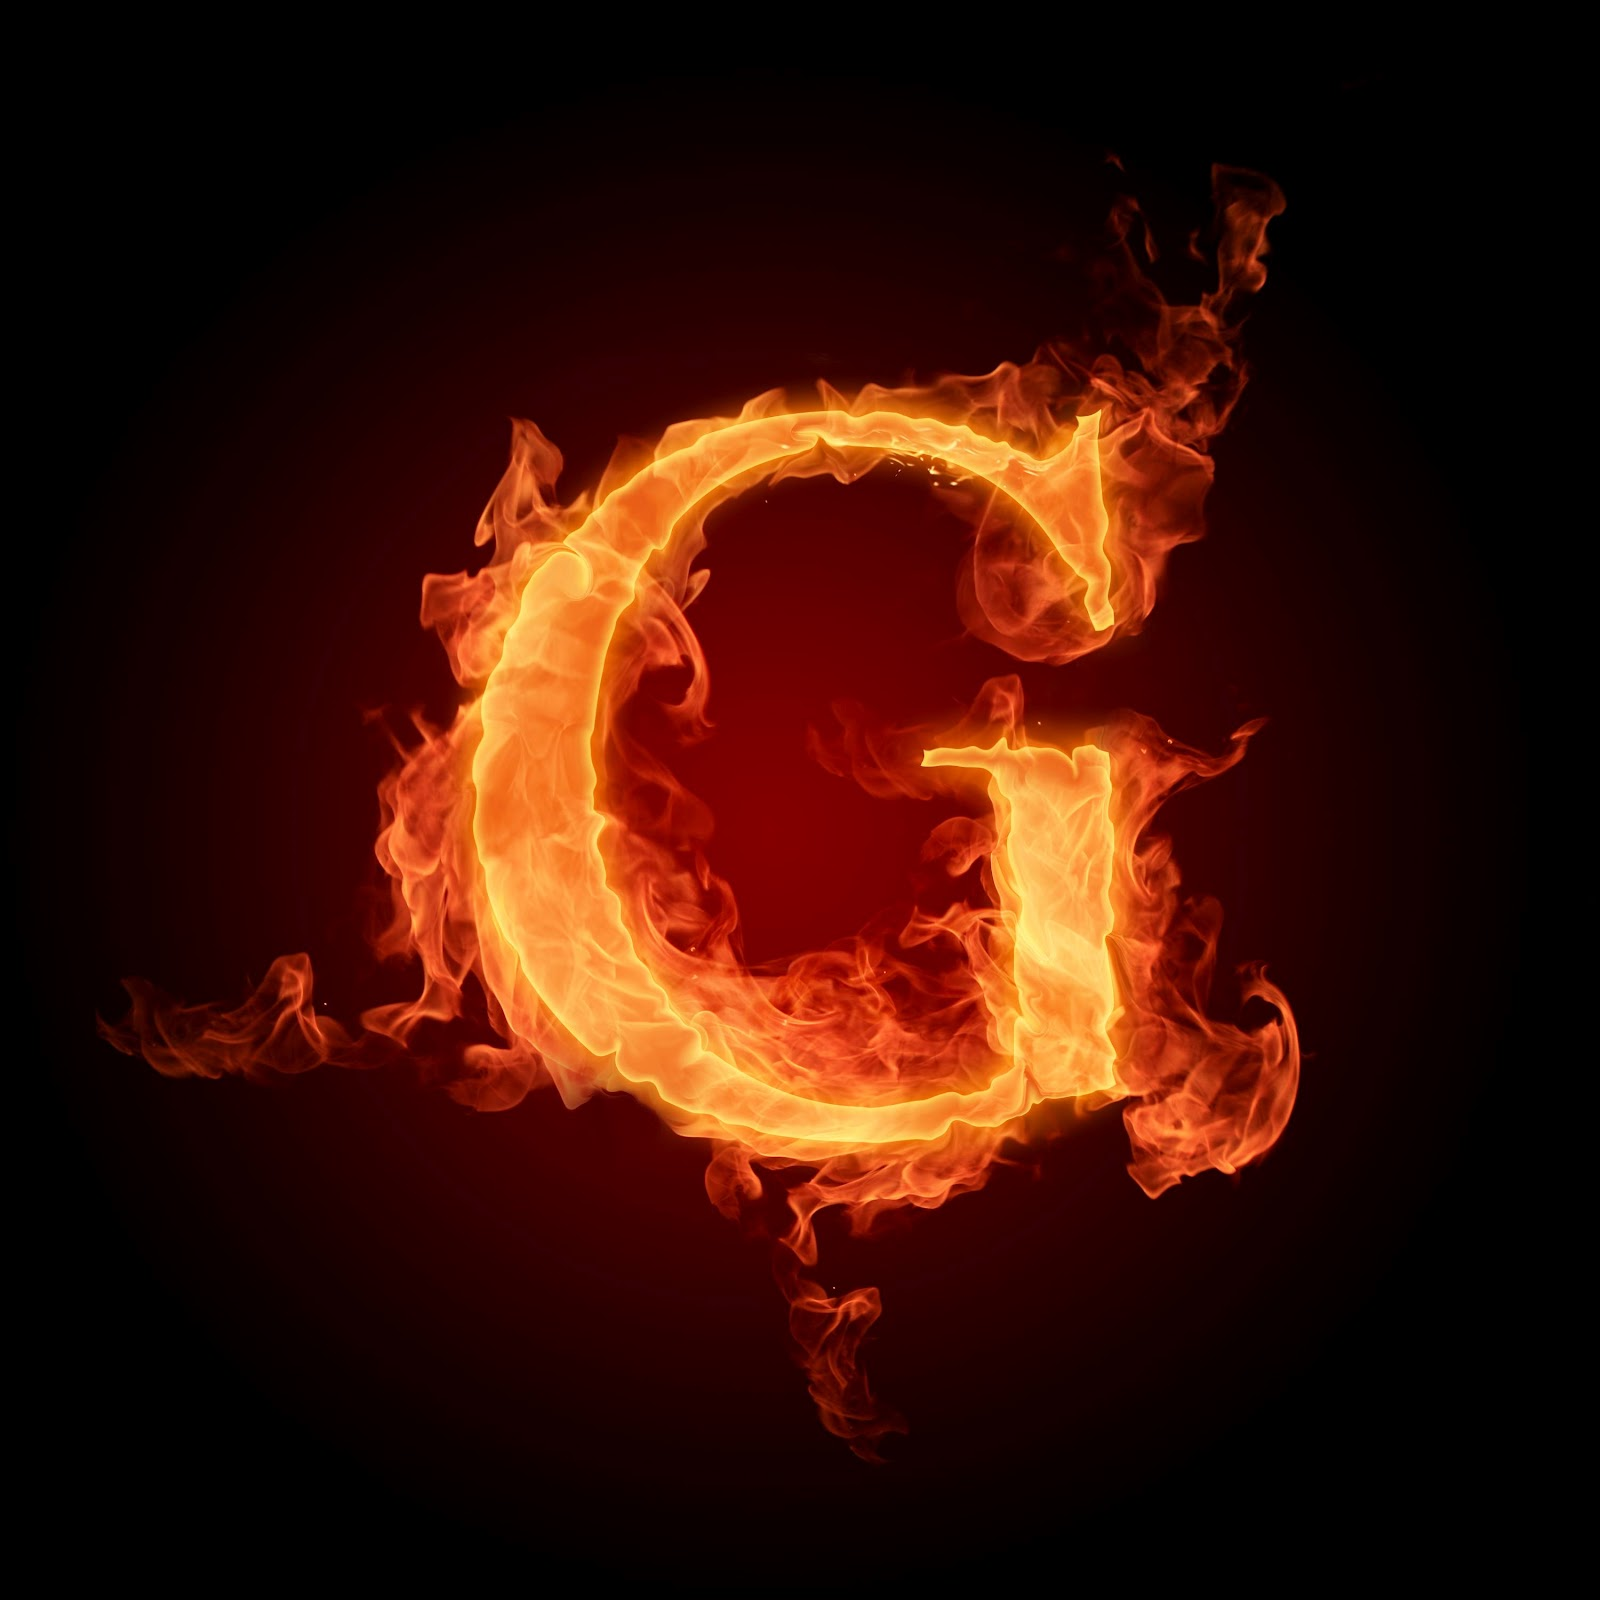 http://4.bp.blogspot.com/-M87HQ7lwry0/UB0yb6-DvSI/AAAAAAAAAJk/FE2UnuKobmY/s1600/Burning%2BAlphabet%2BWallpaper%2BG.jpg